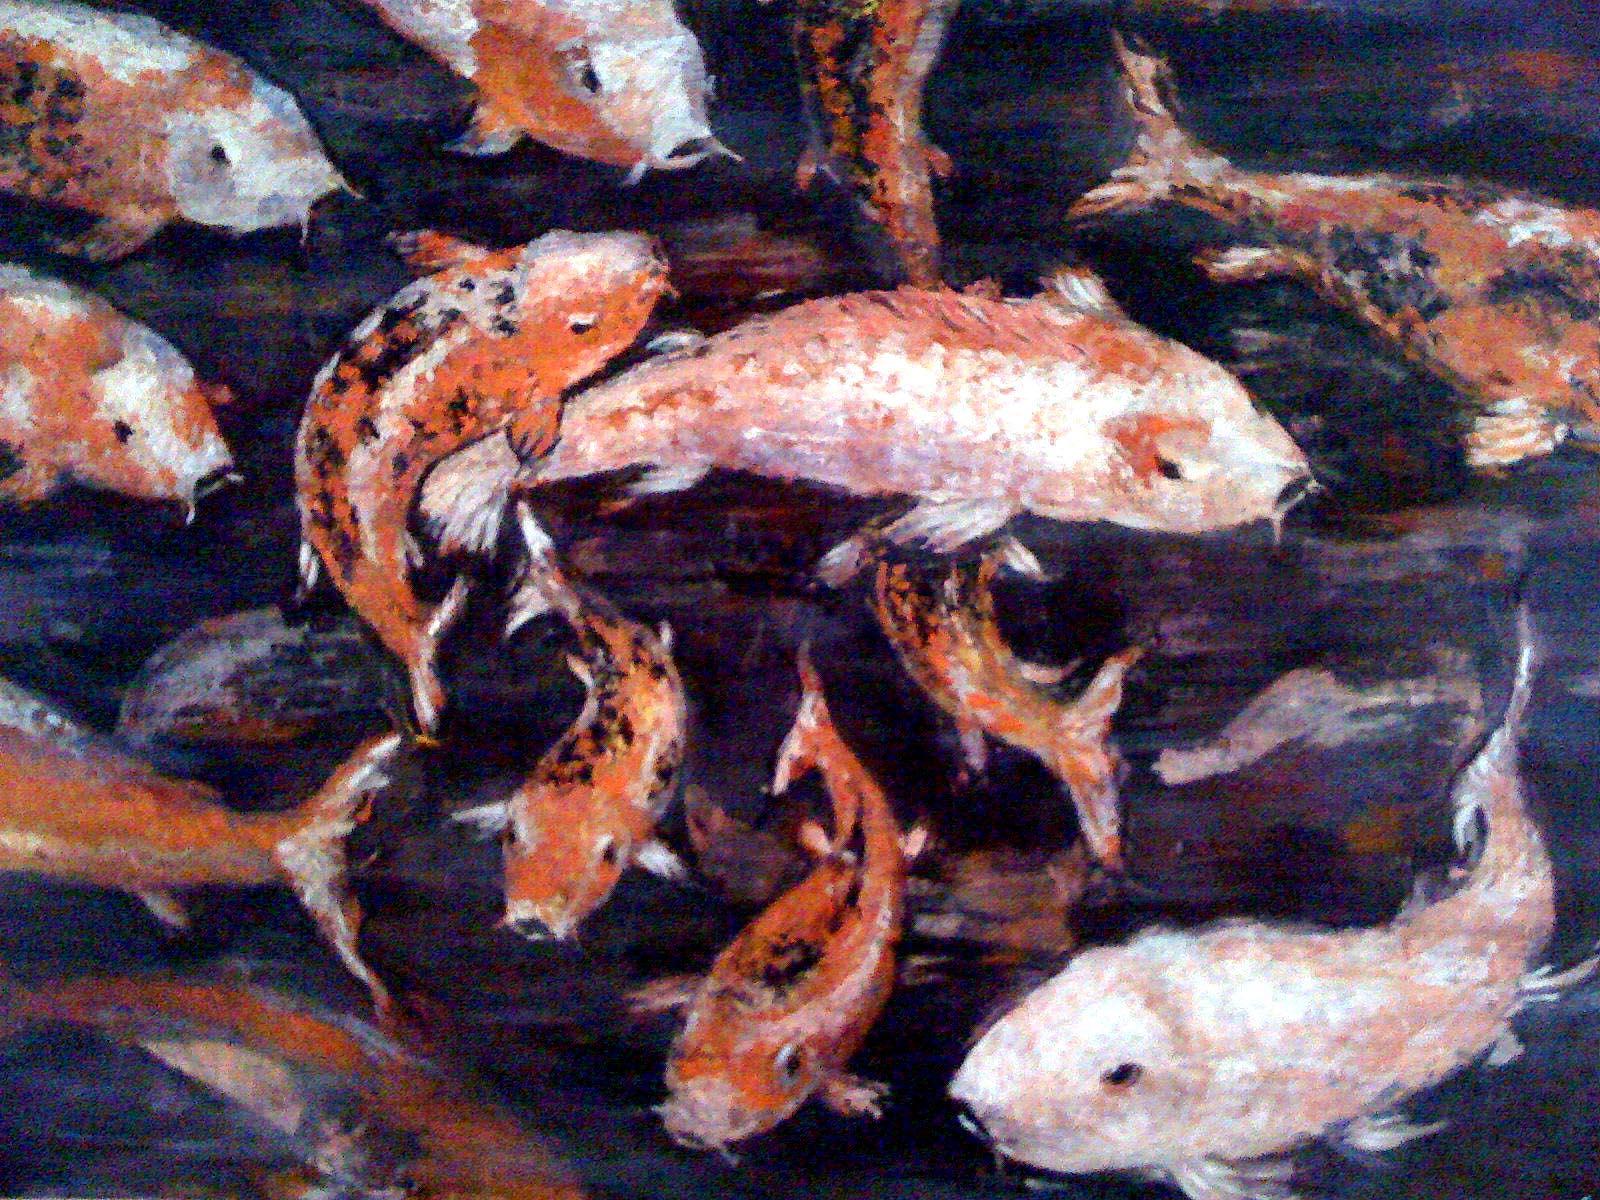 Koi fish oil on canvas nick petronzio sculpture for Ph for koi fish